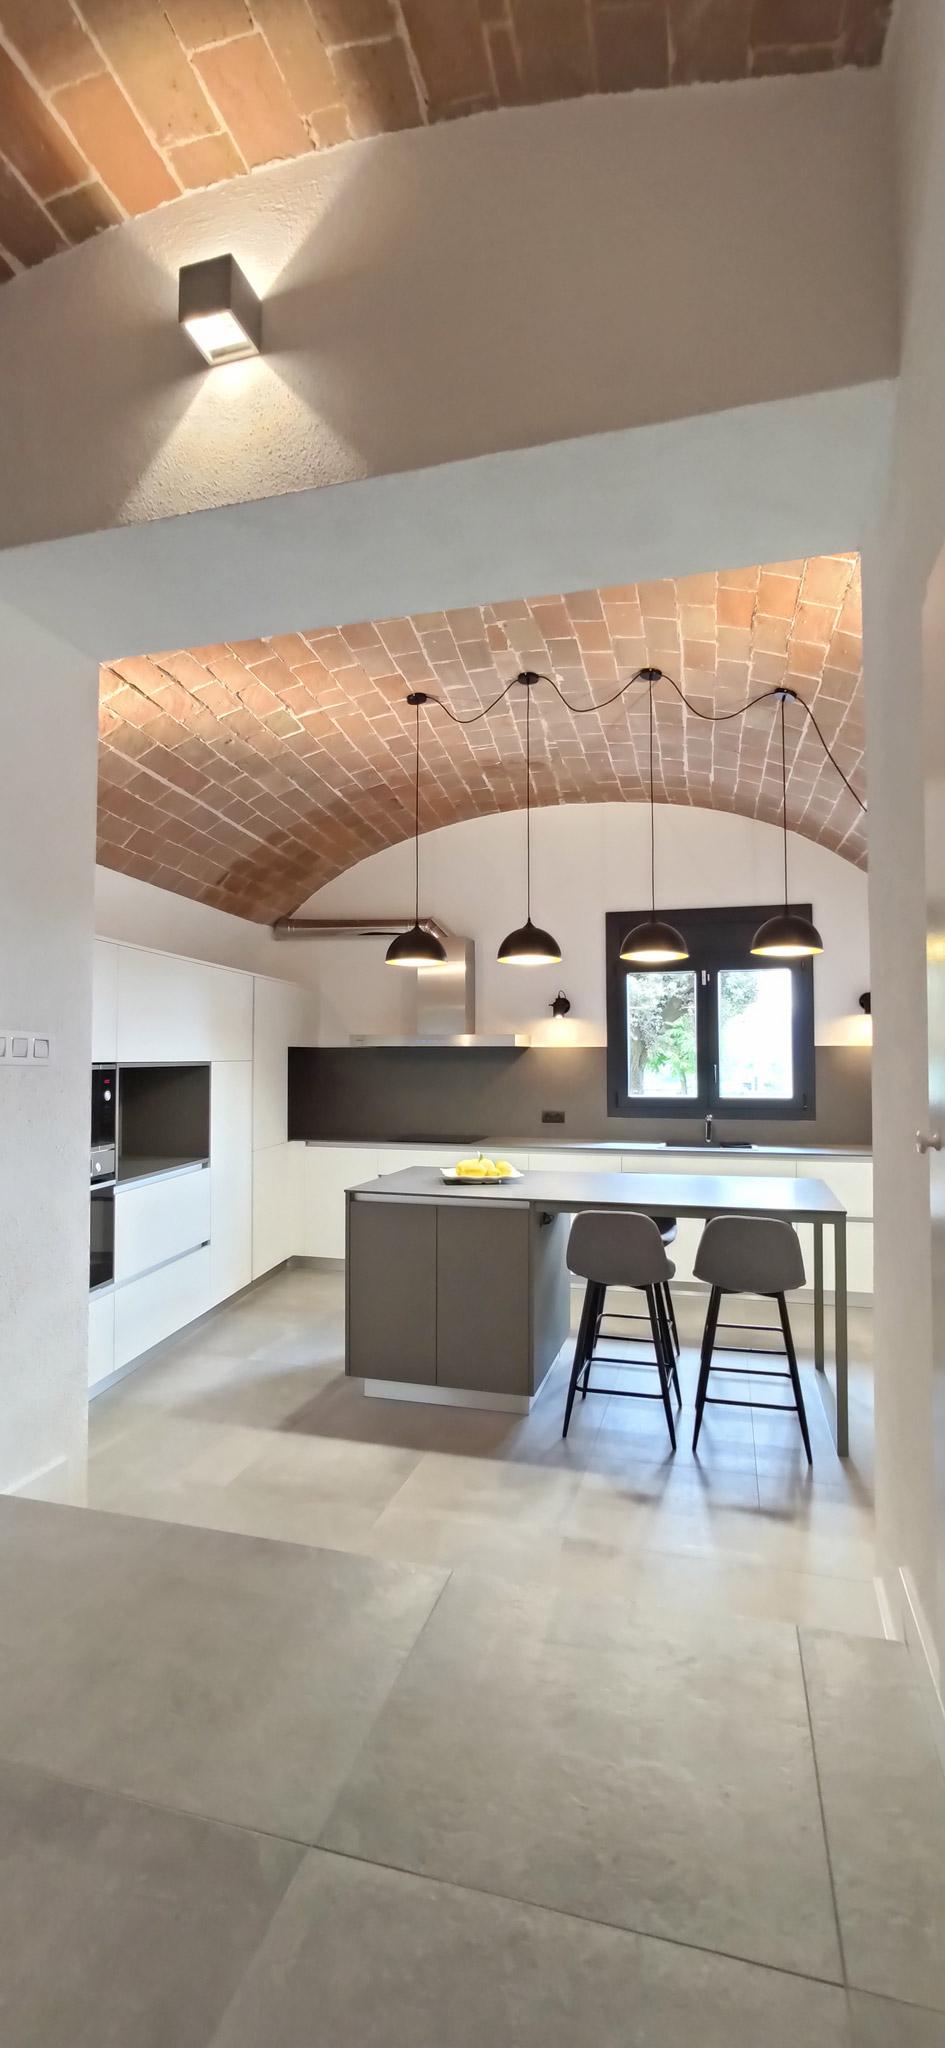 atelier4-anna-junca-interiorista-disseny-interiors-arquitectura-interior-interiorisme-banyoles-cuina-vic-costa-brava-barcelona-girona-emporda-reforma-1